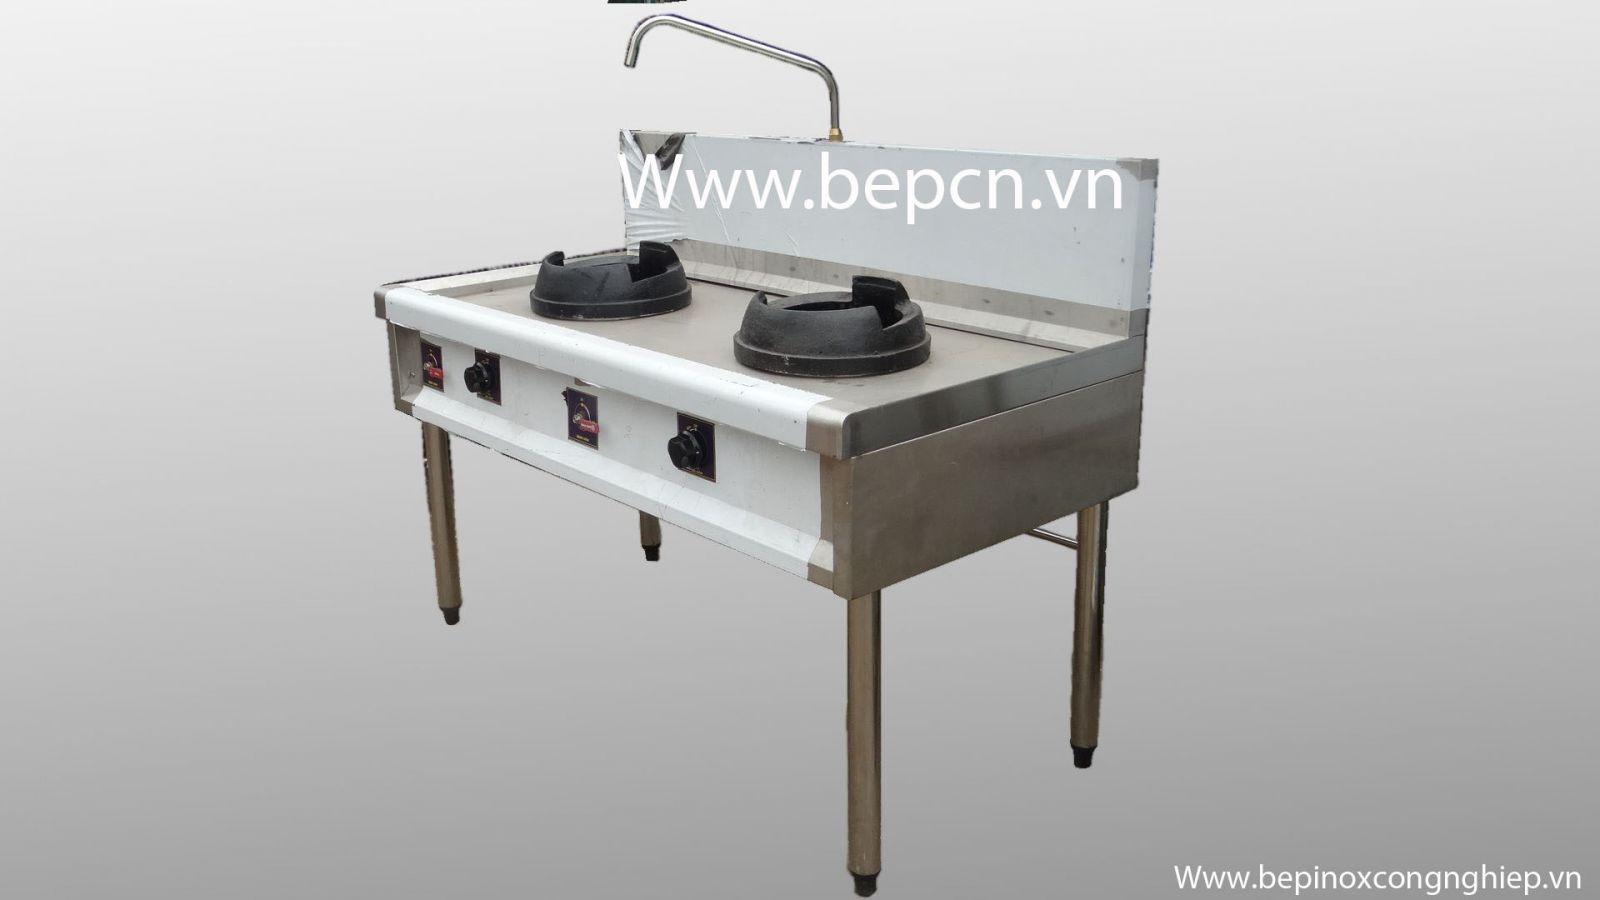 Bếp Á đôi Model SCBA2 - 7B1500